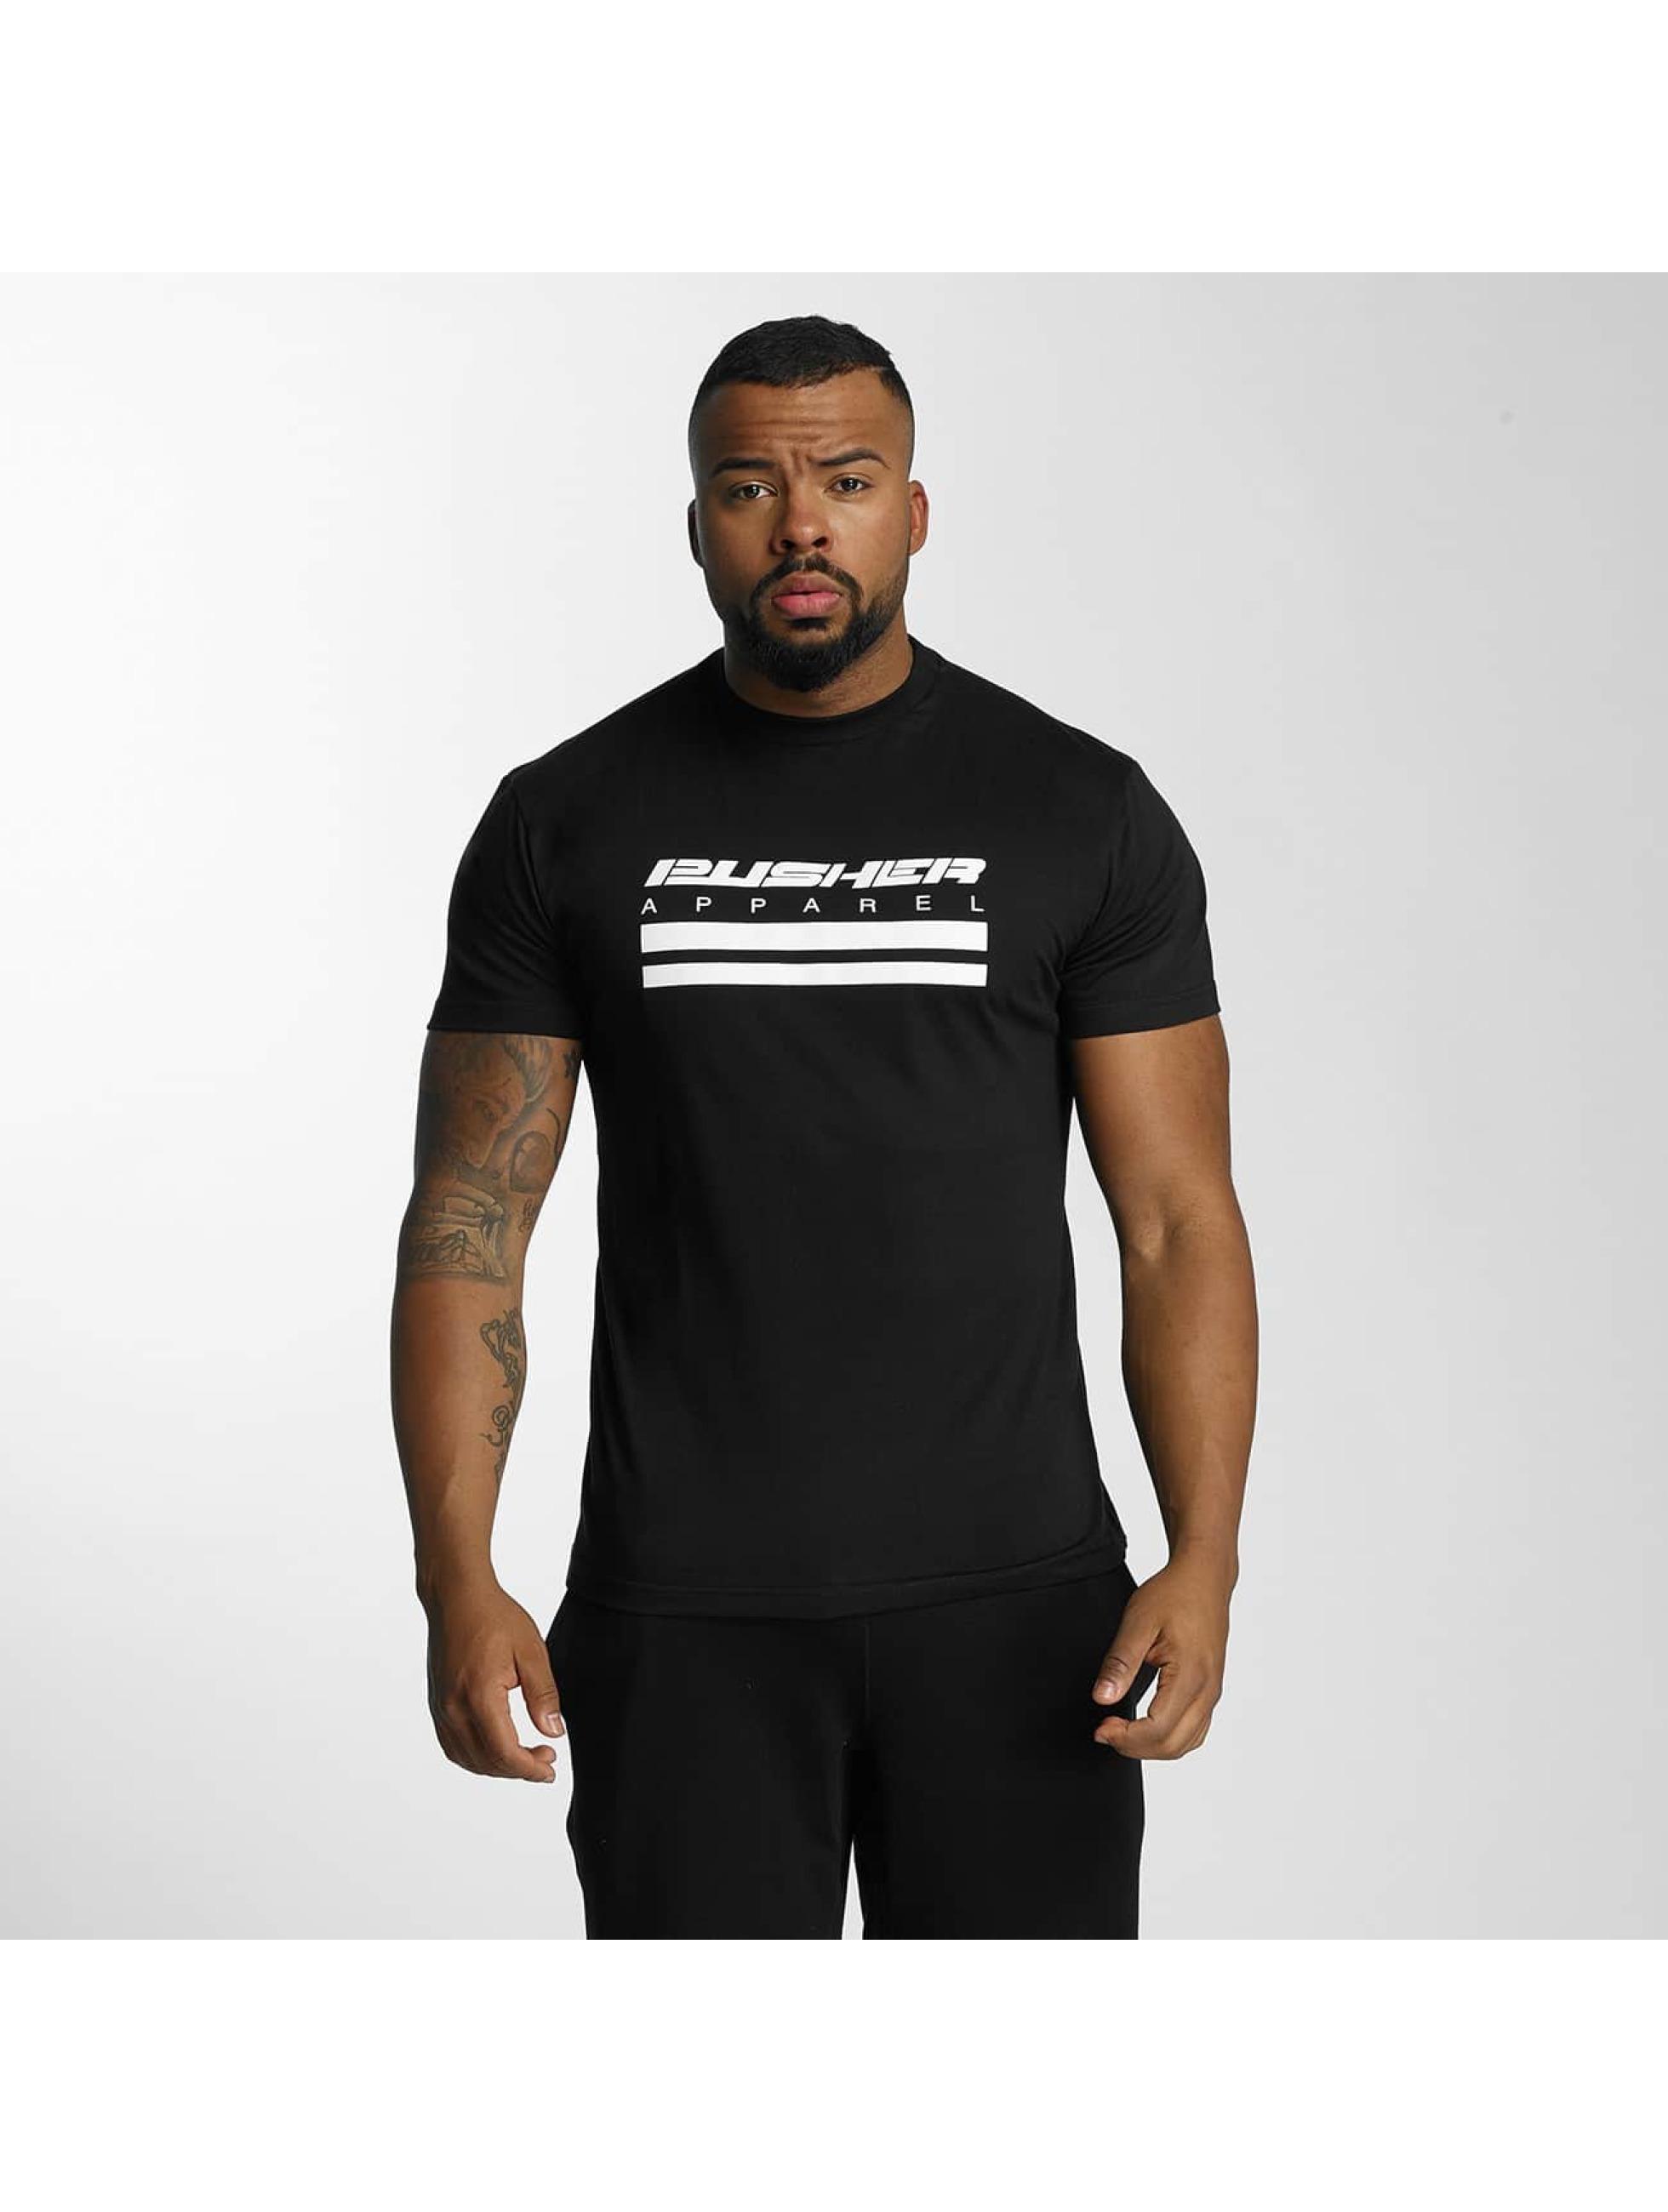 Pusher Apparel Camiseta Apparel 503 Theft negro